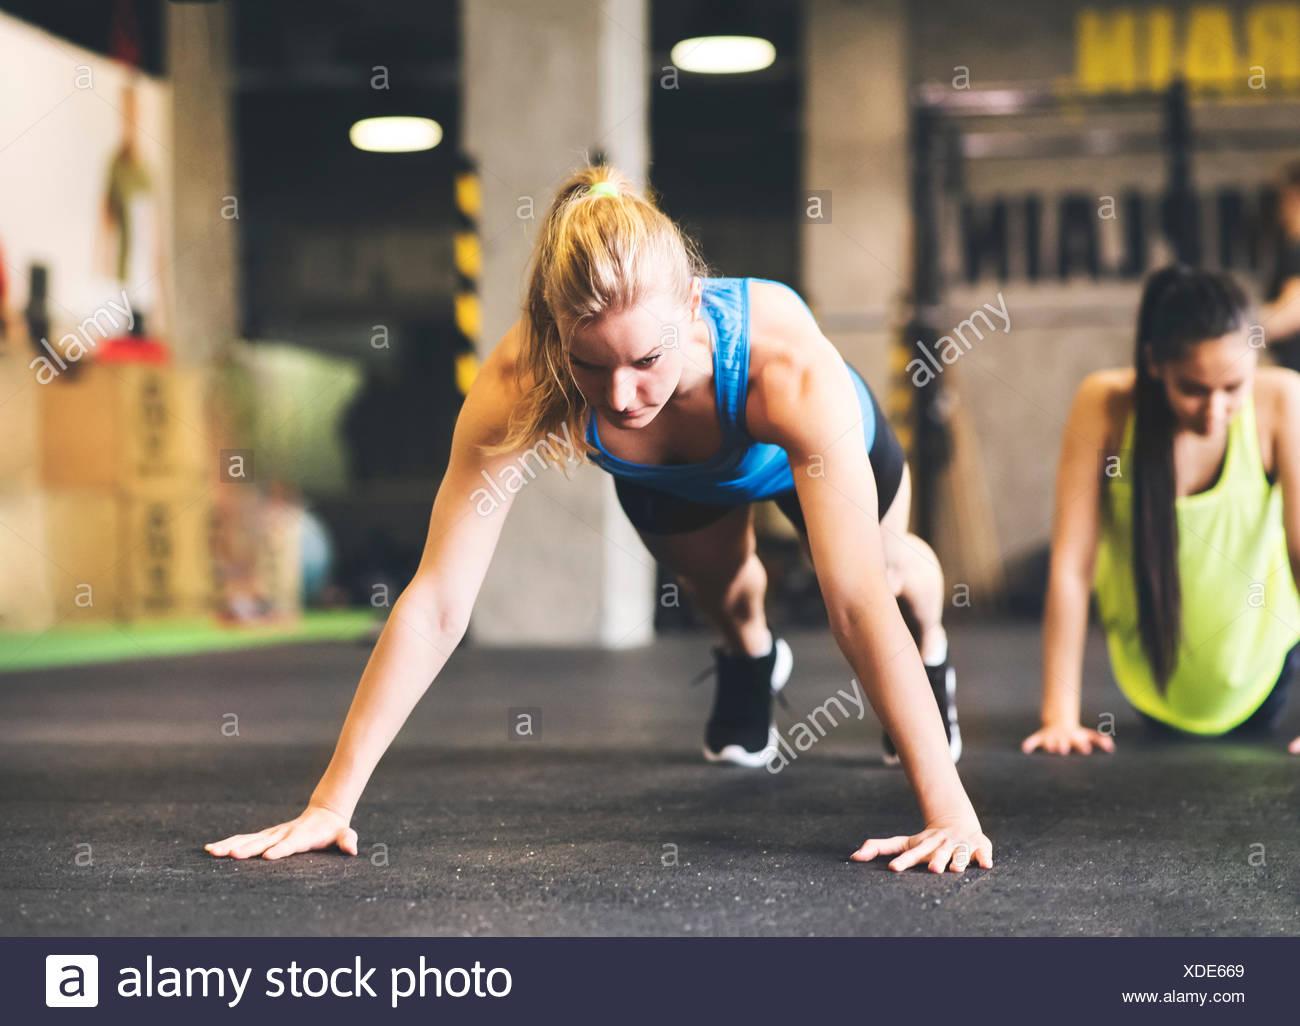 Giovane donna facendo push-up in palestra Immagini Stock